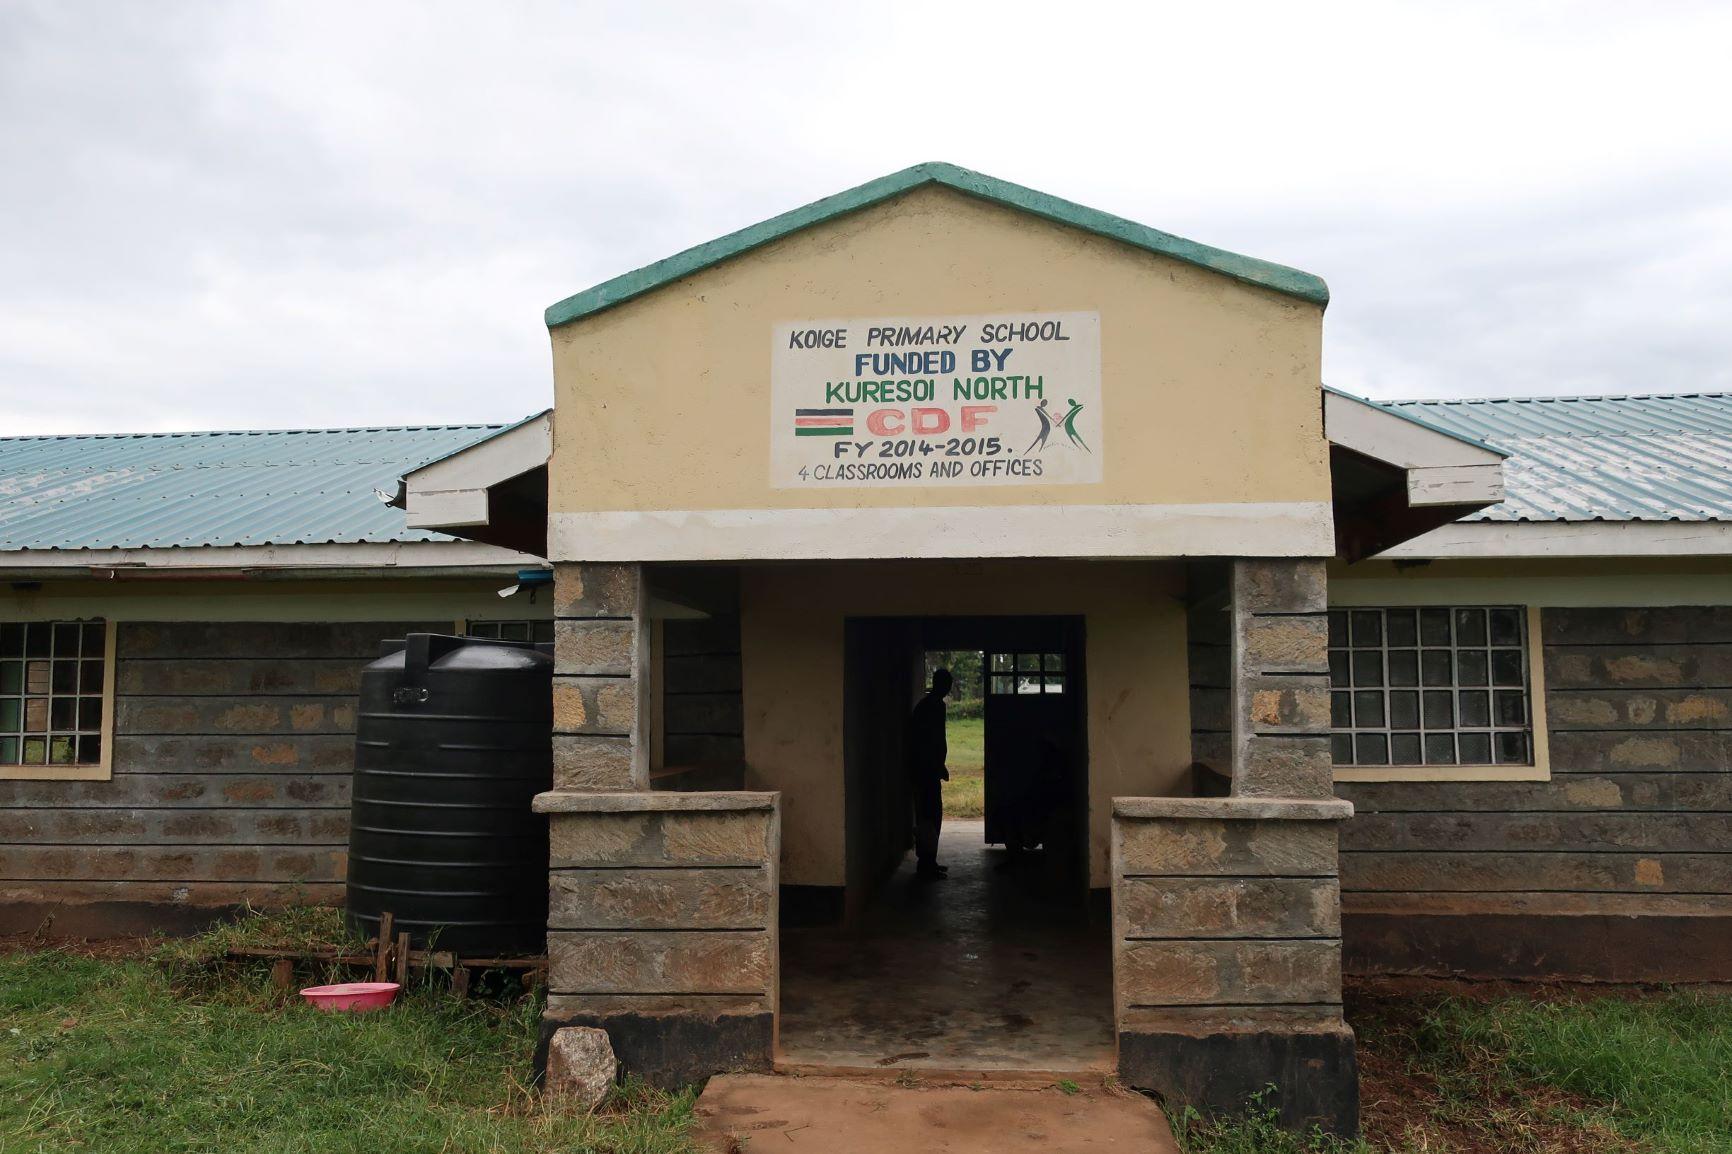 KENYA: KERICHO: KOIGE PRIMARY SCHOOL